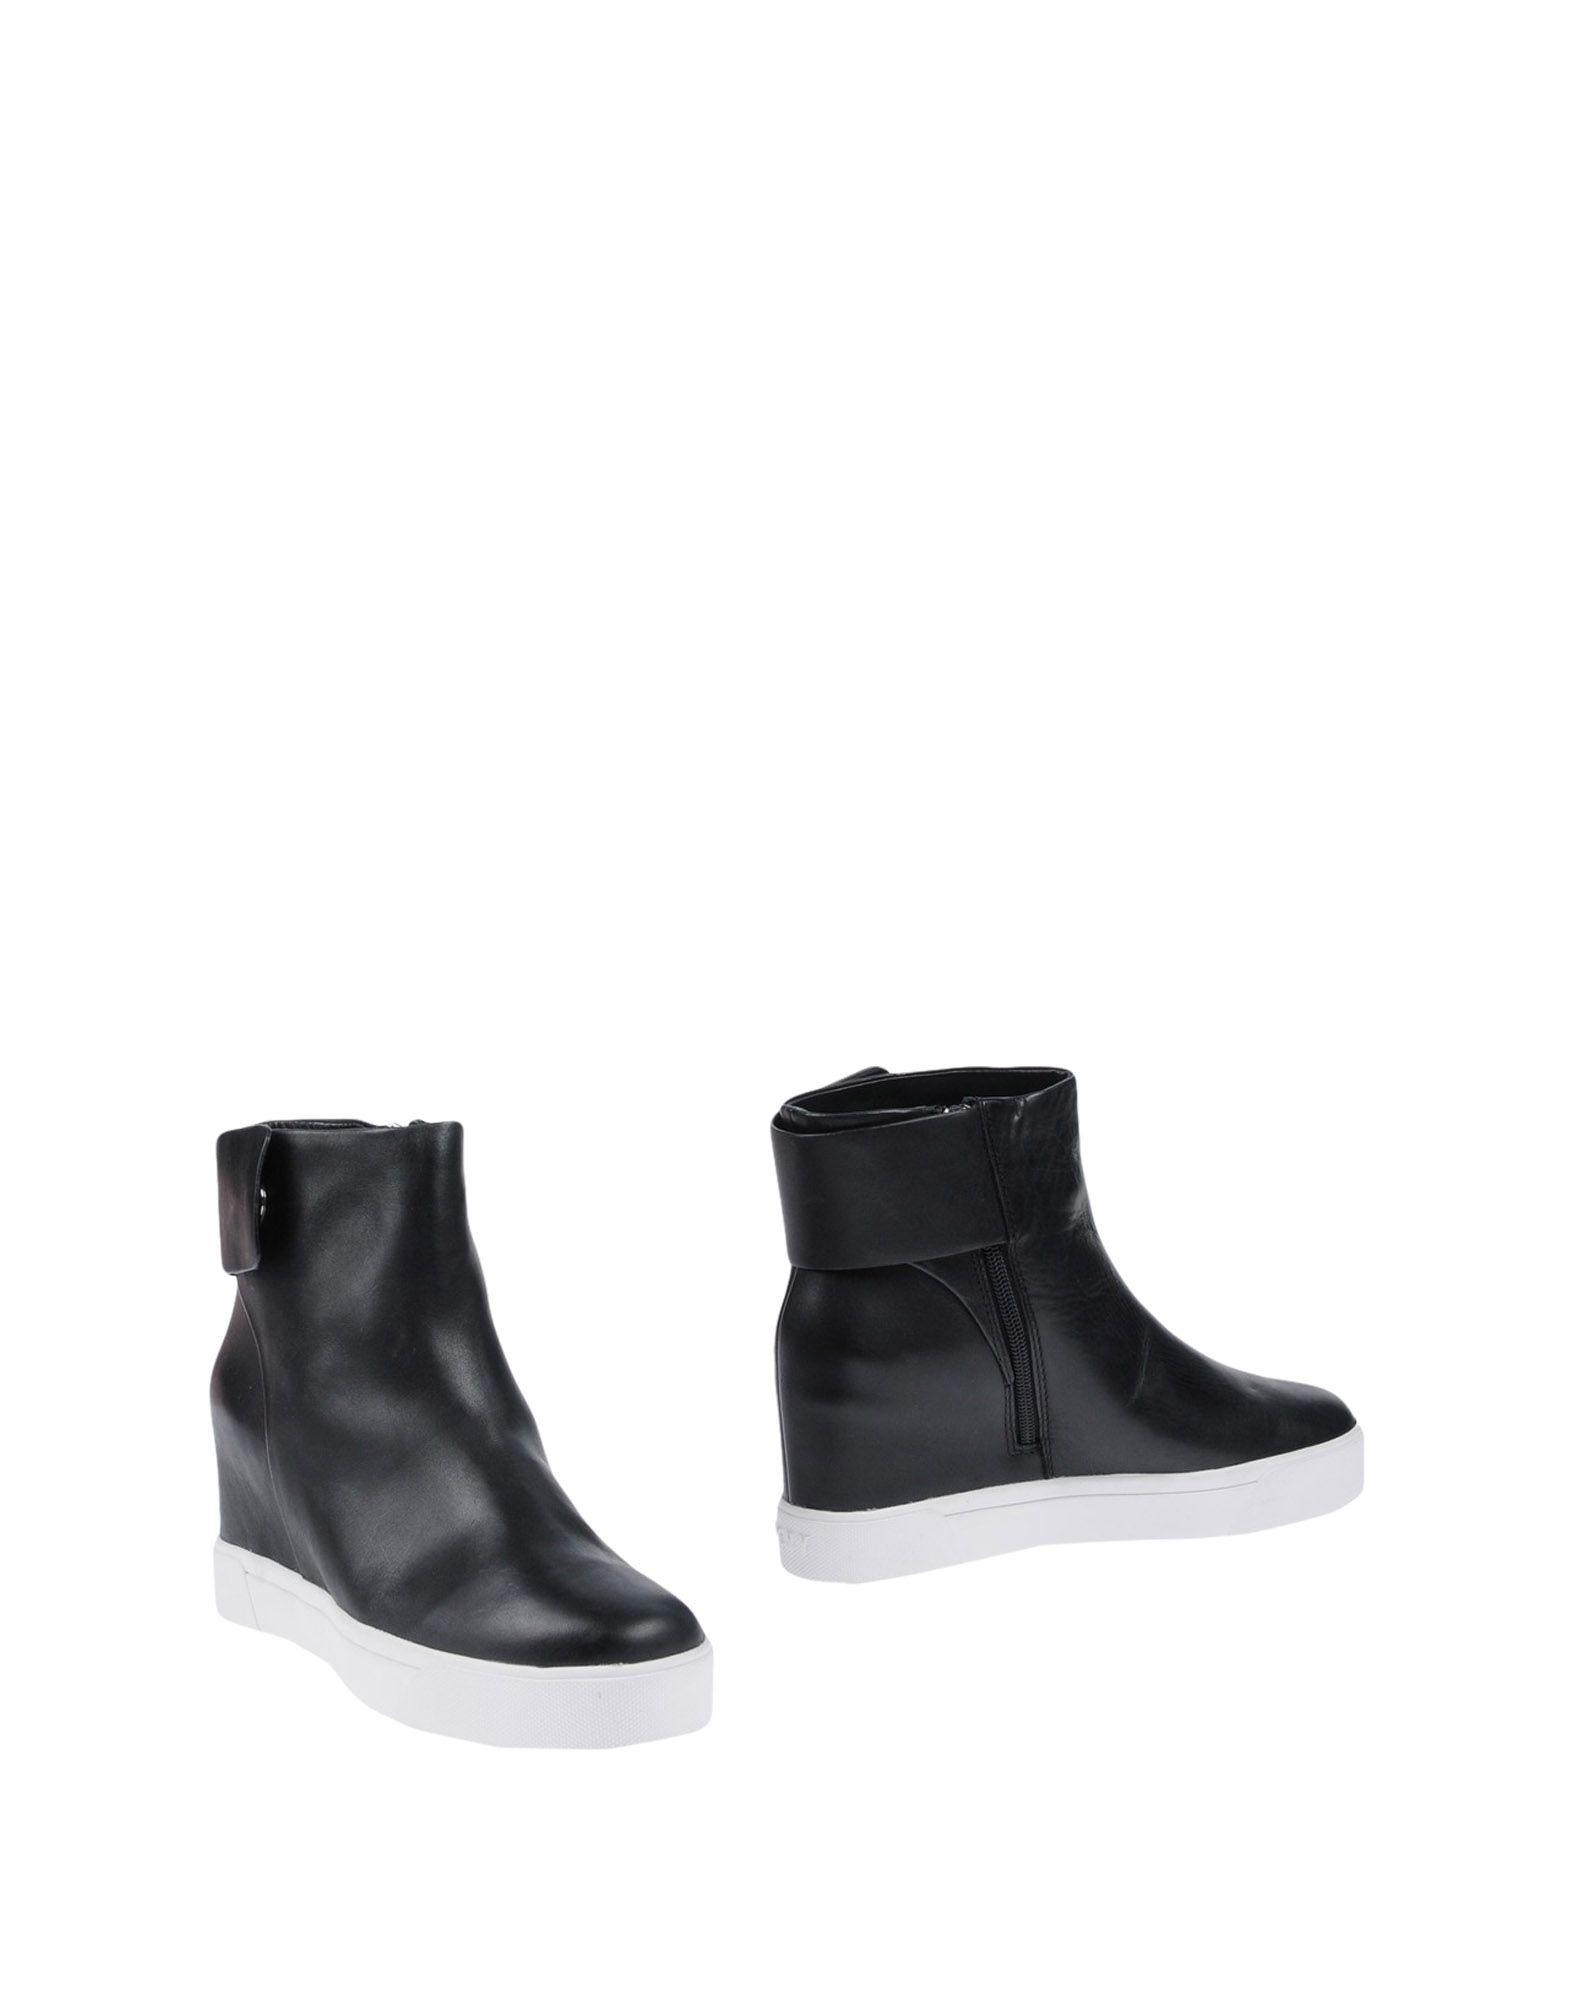 Dkny Damen Stiefelette Damen Dkny 11453332OSGut aussehende strapazierfähige Schuhe 6501fc